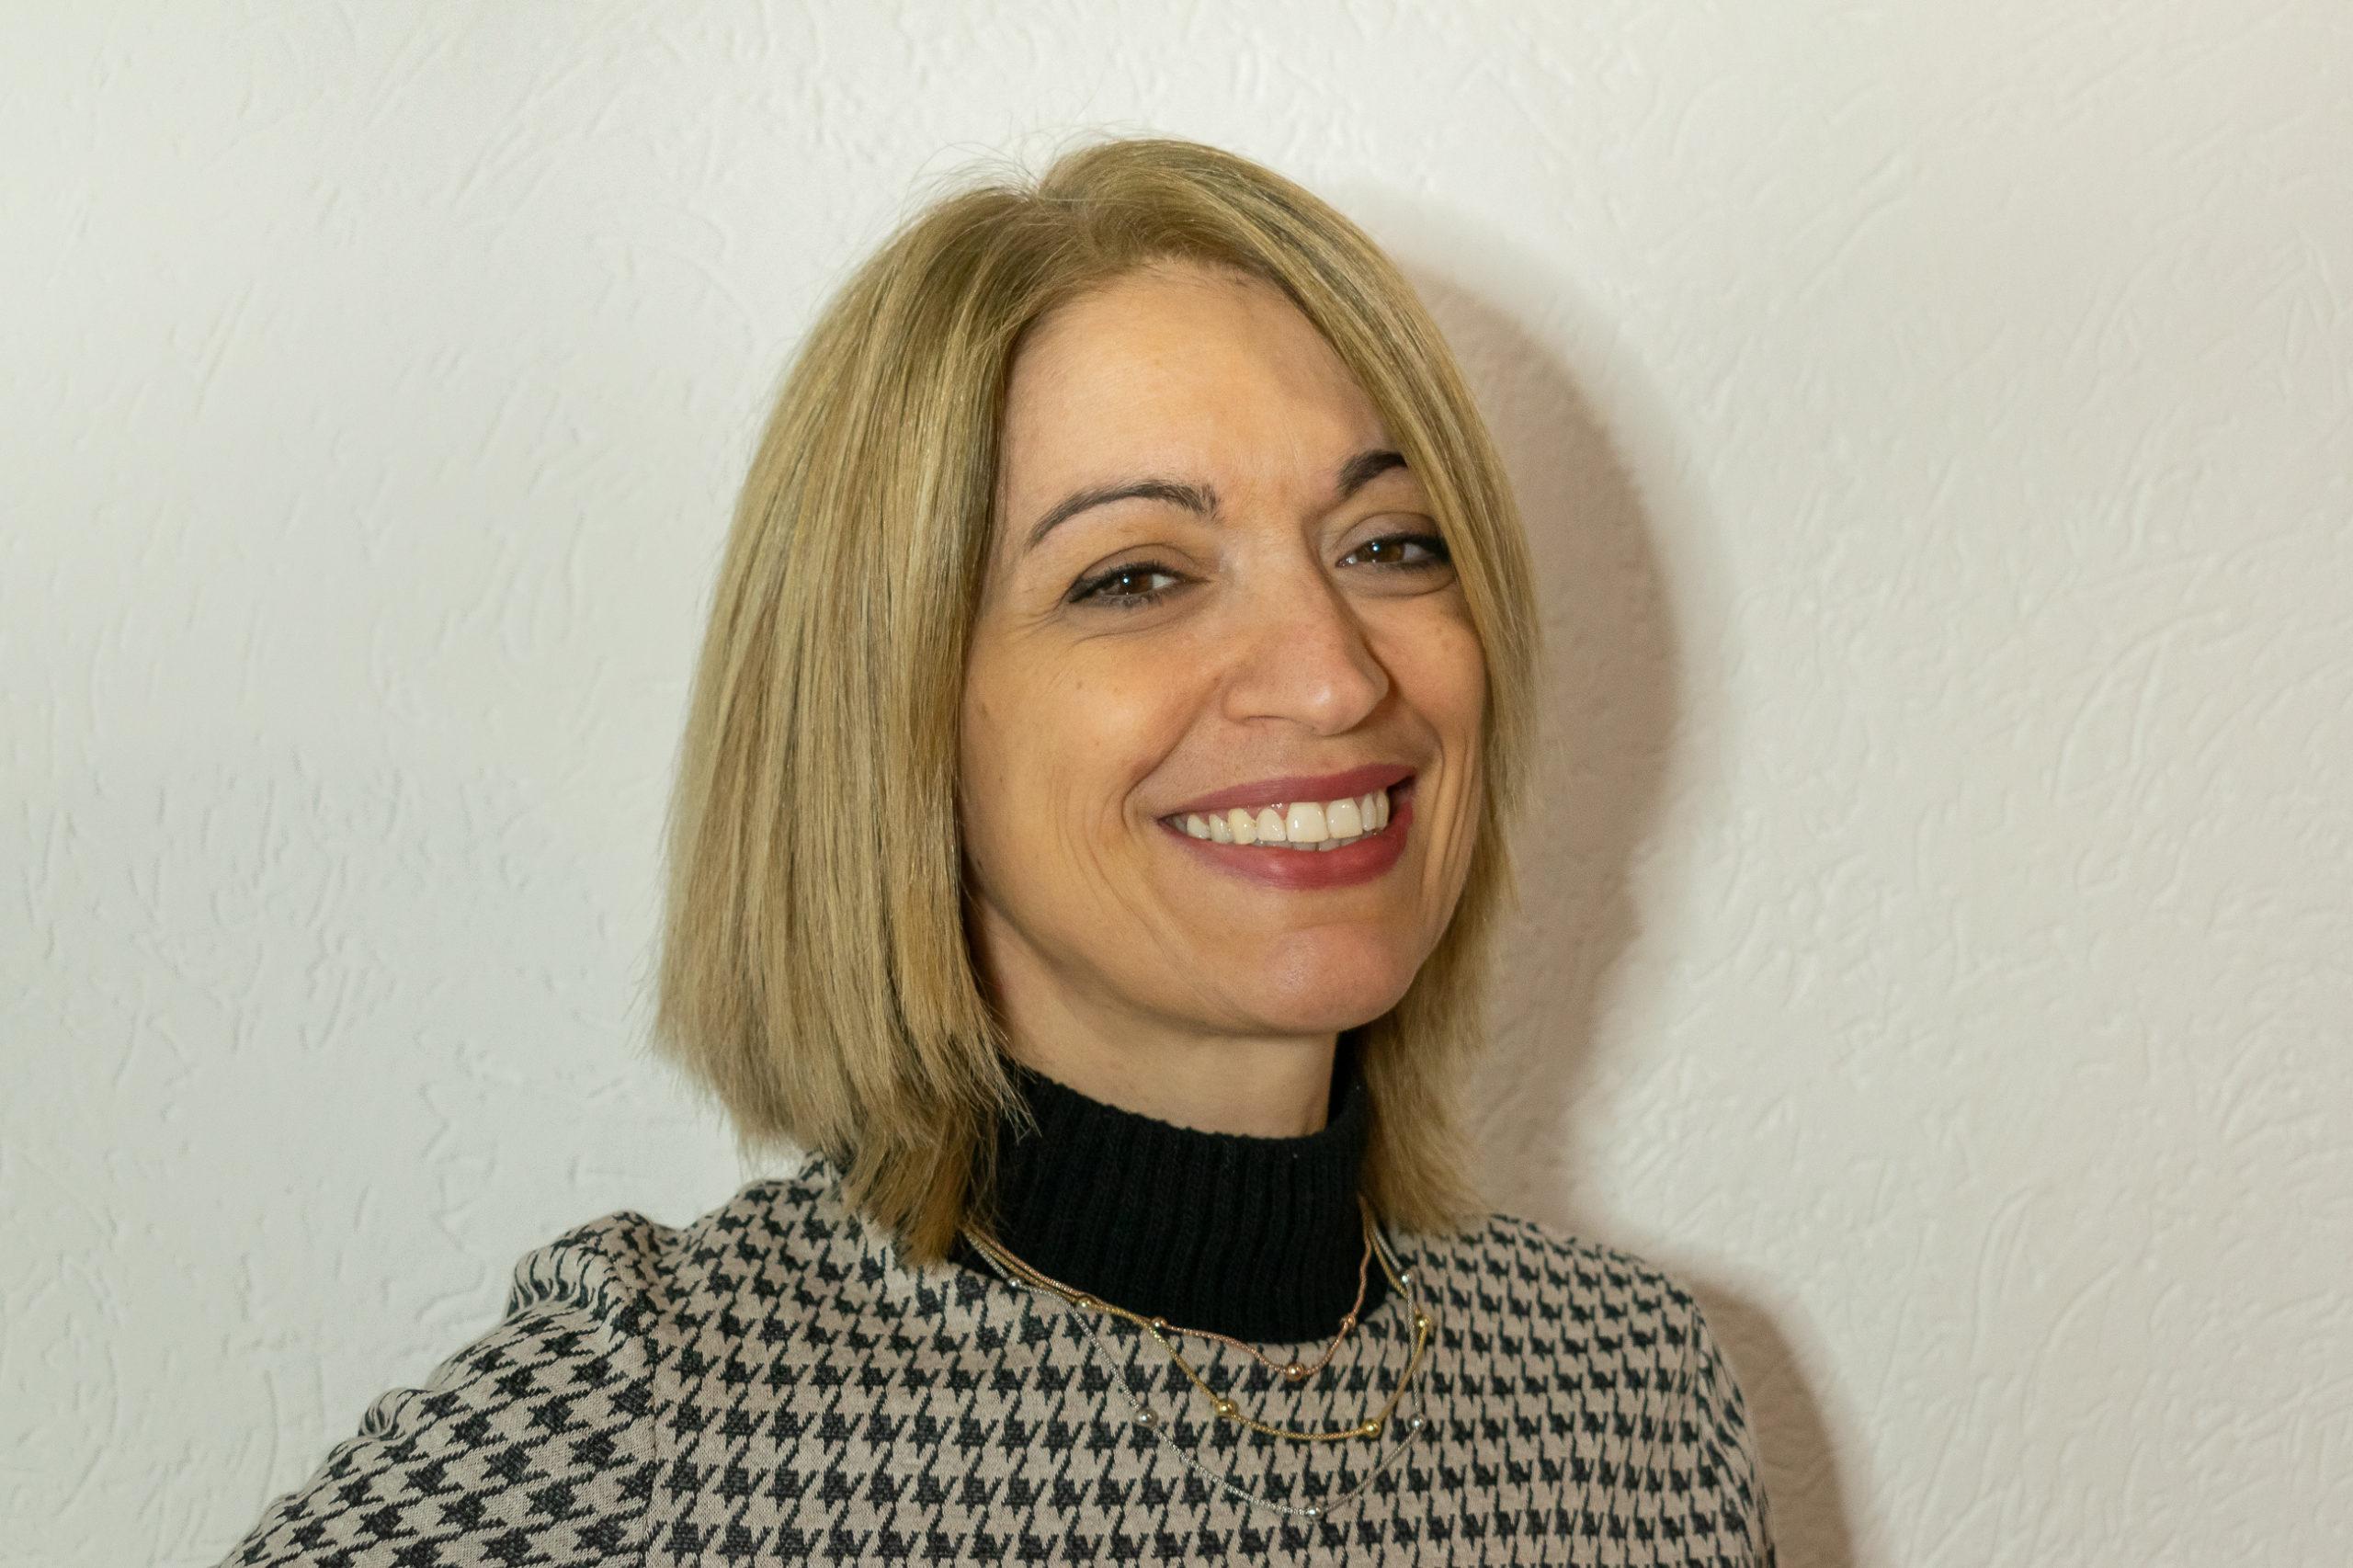 Marilisa Piras